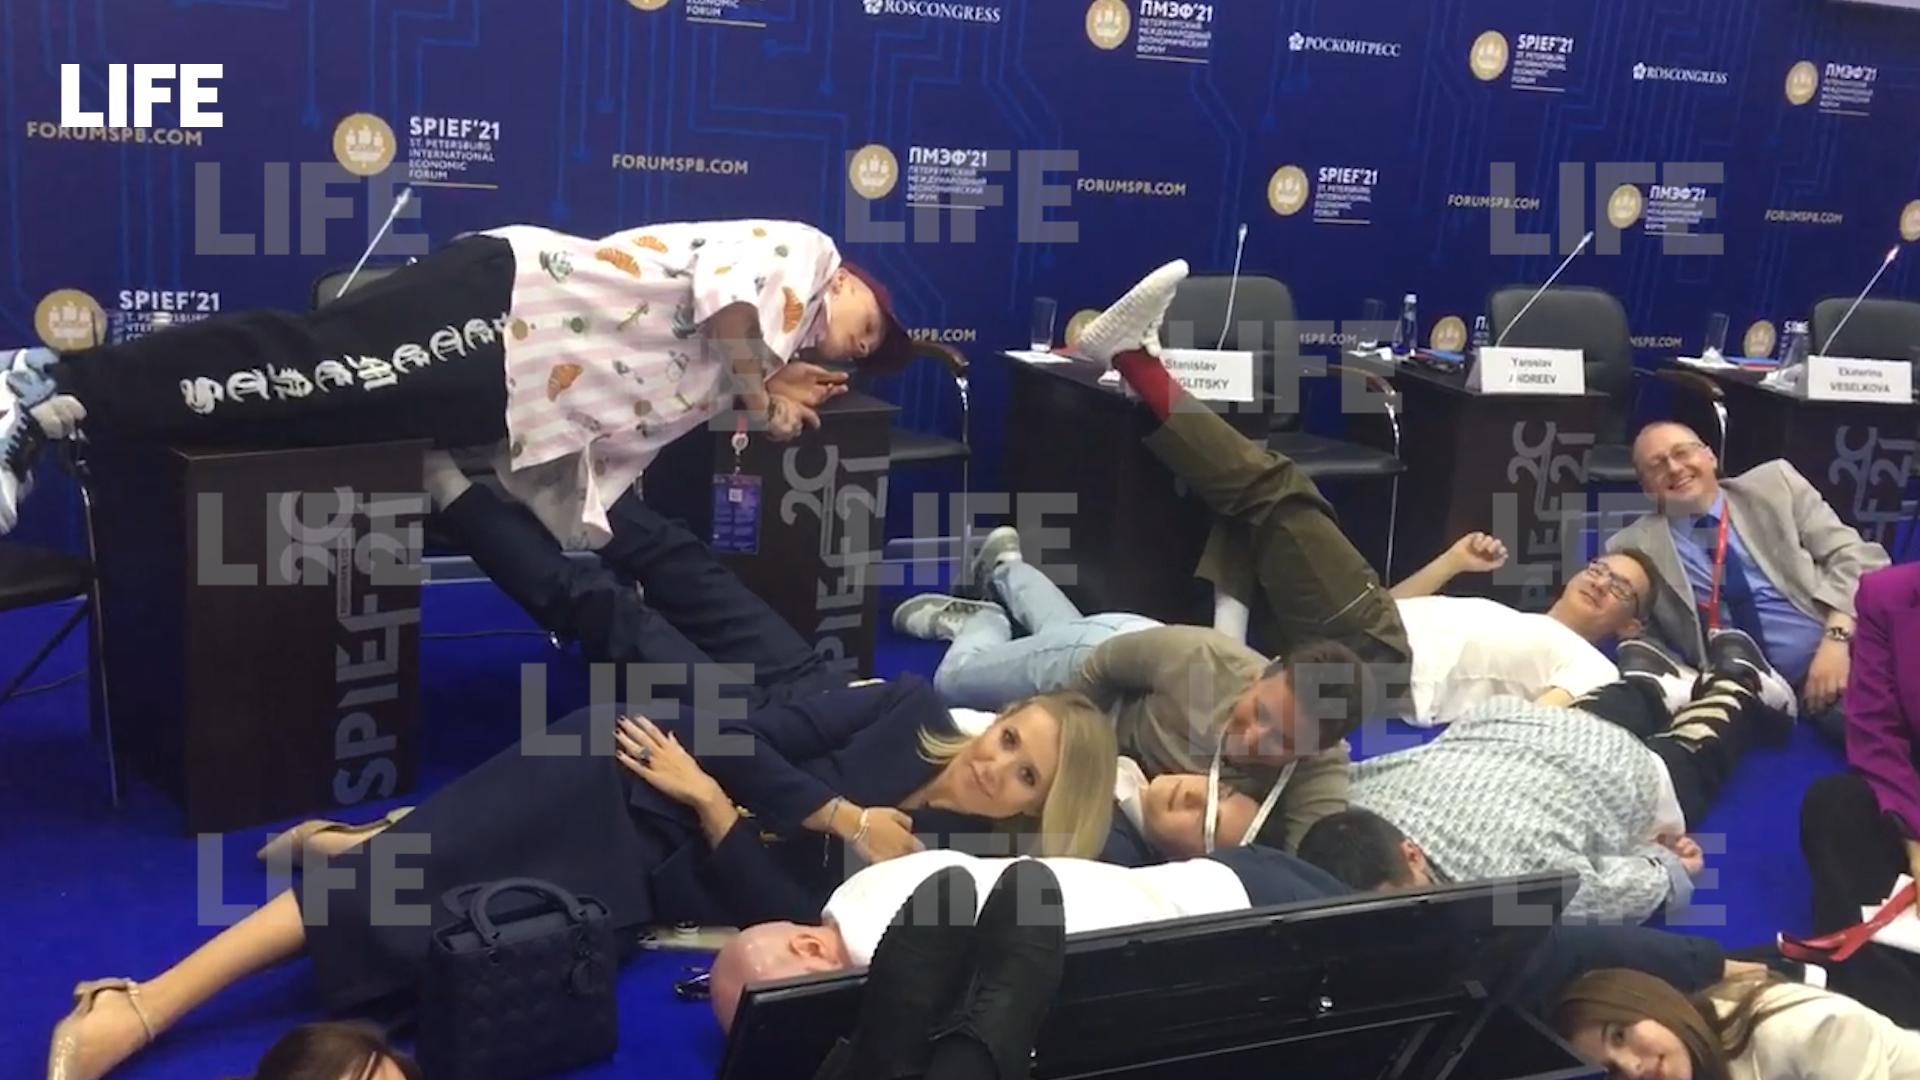 Даня Милохин снял на ПМЭФ видео с валяющейся на полу Собчак для TikTok